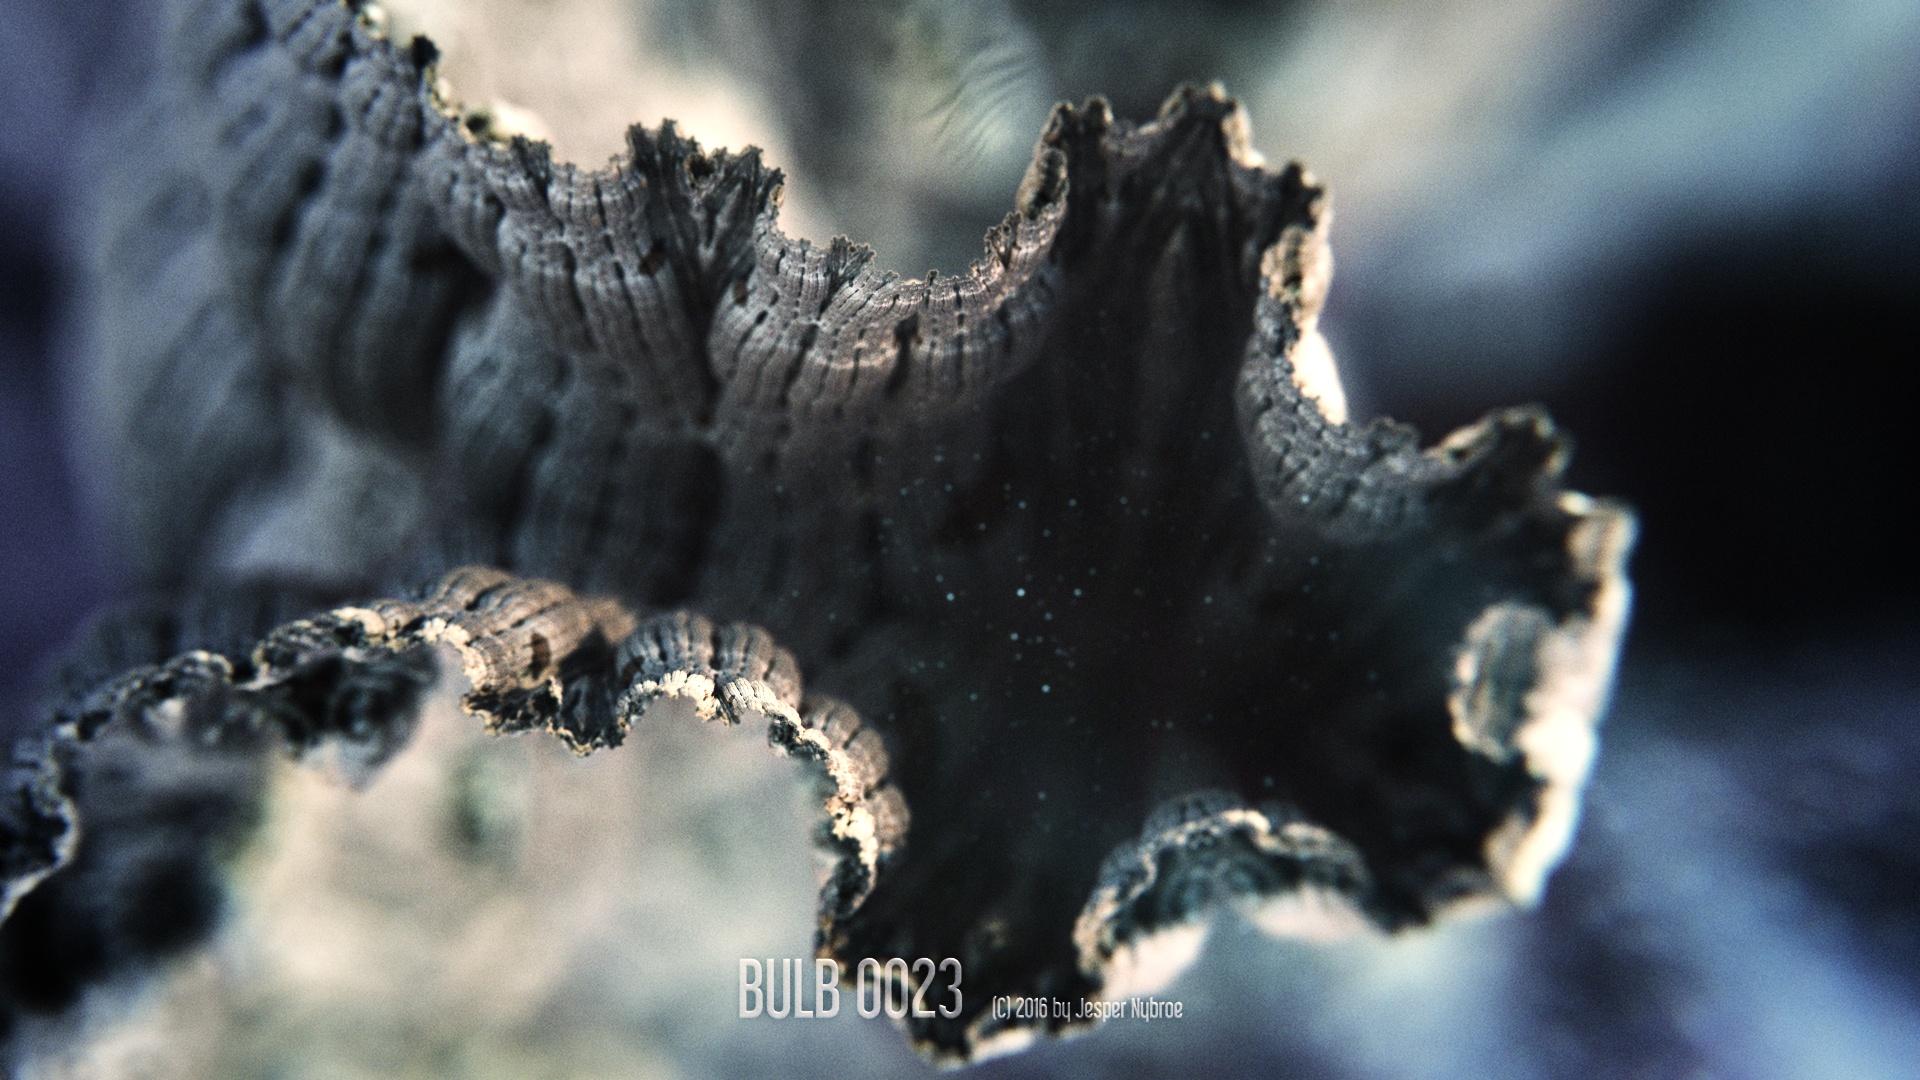 Bulb_0023.0001.jpg